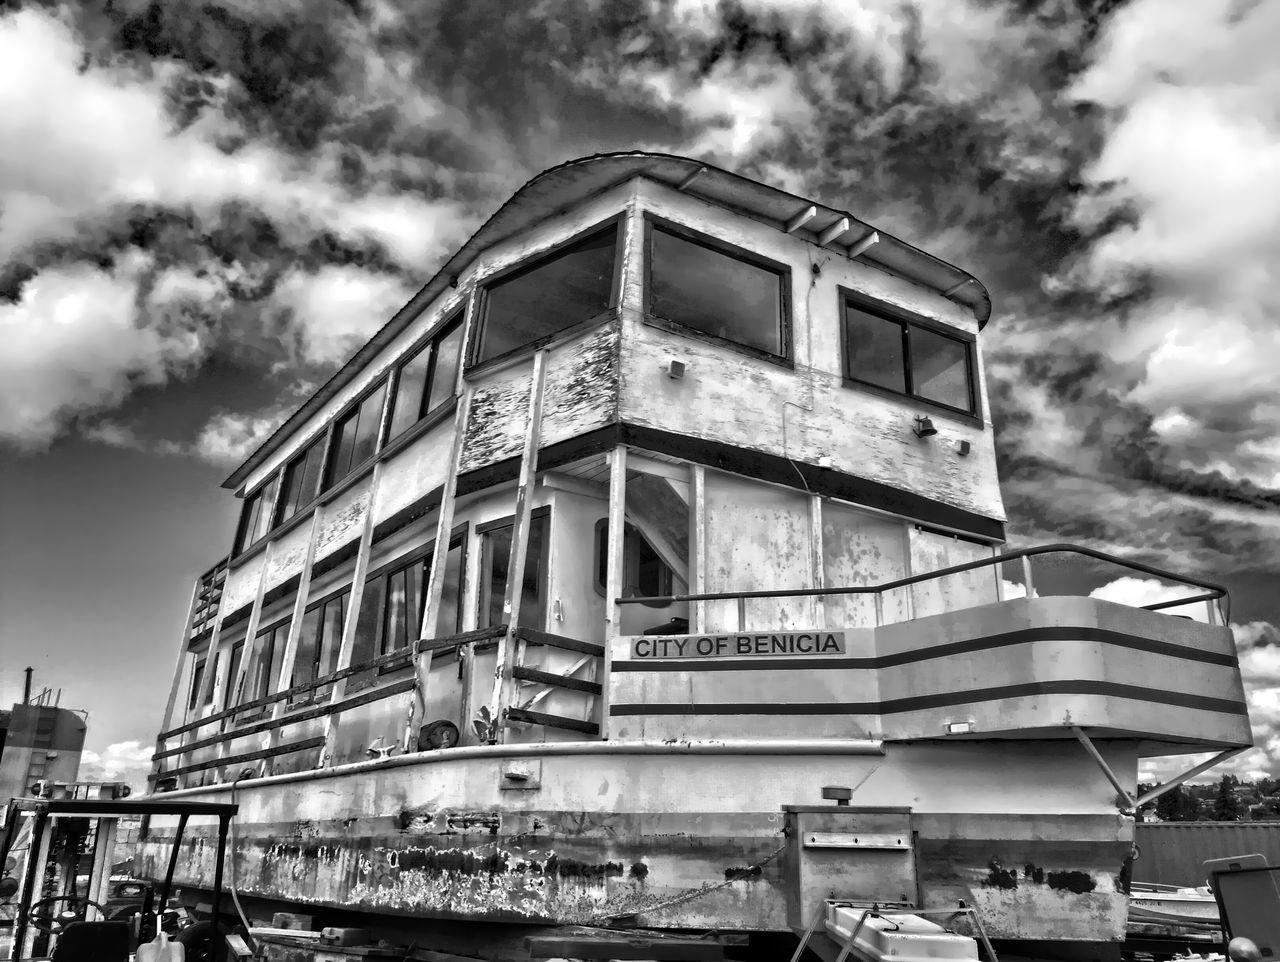 """City of Benicia"" Ship Ships Shipwreck Boats Boat Boatyard Blackandwhite Black And White Blackandwhite Photography Black&white"